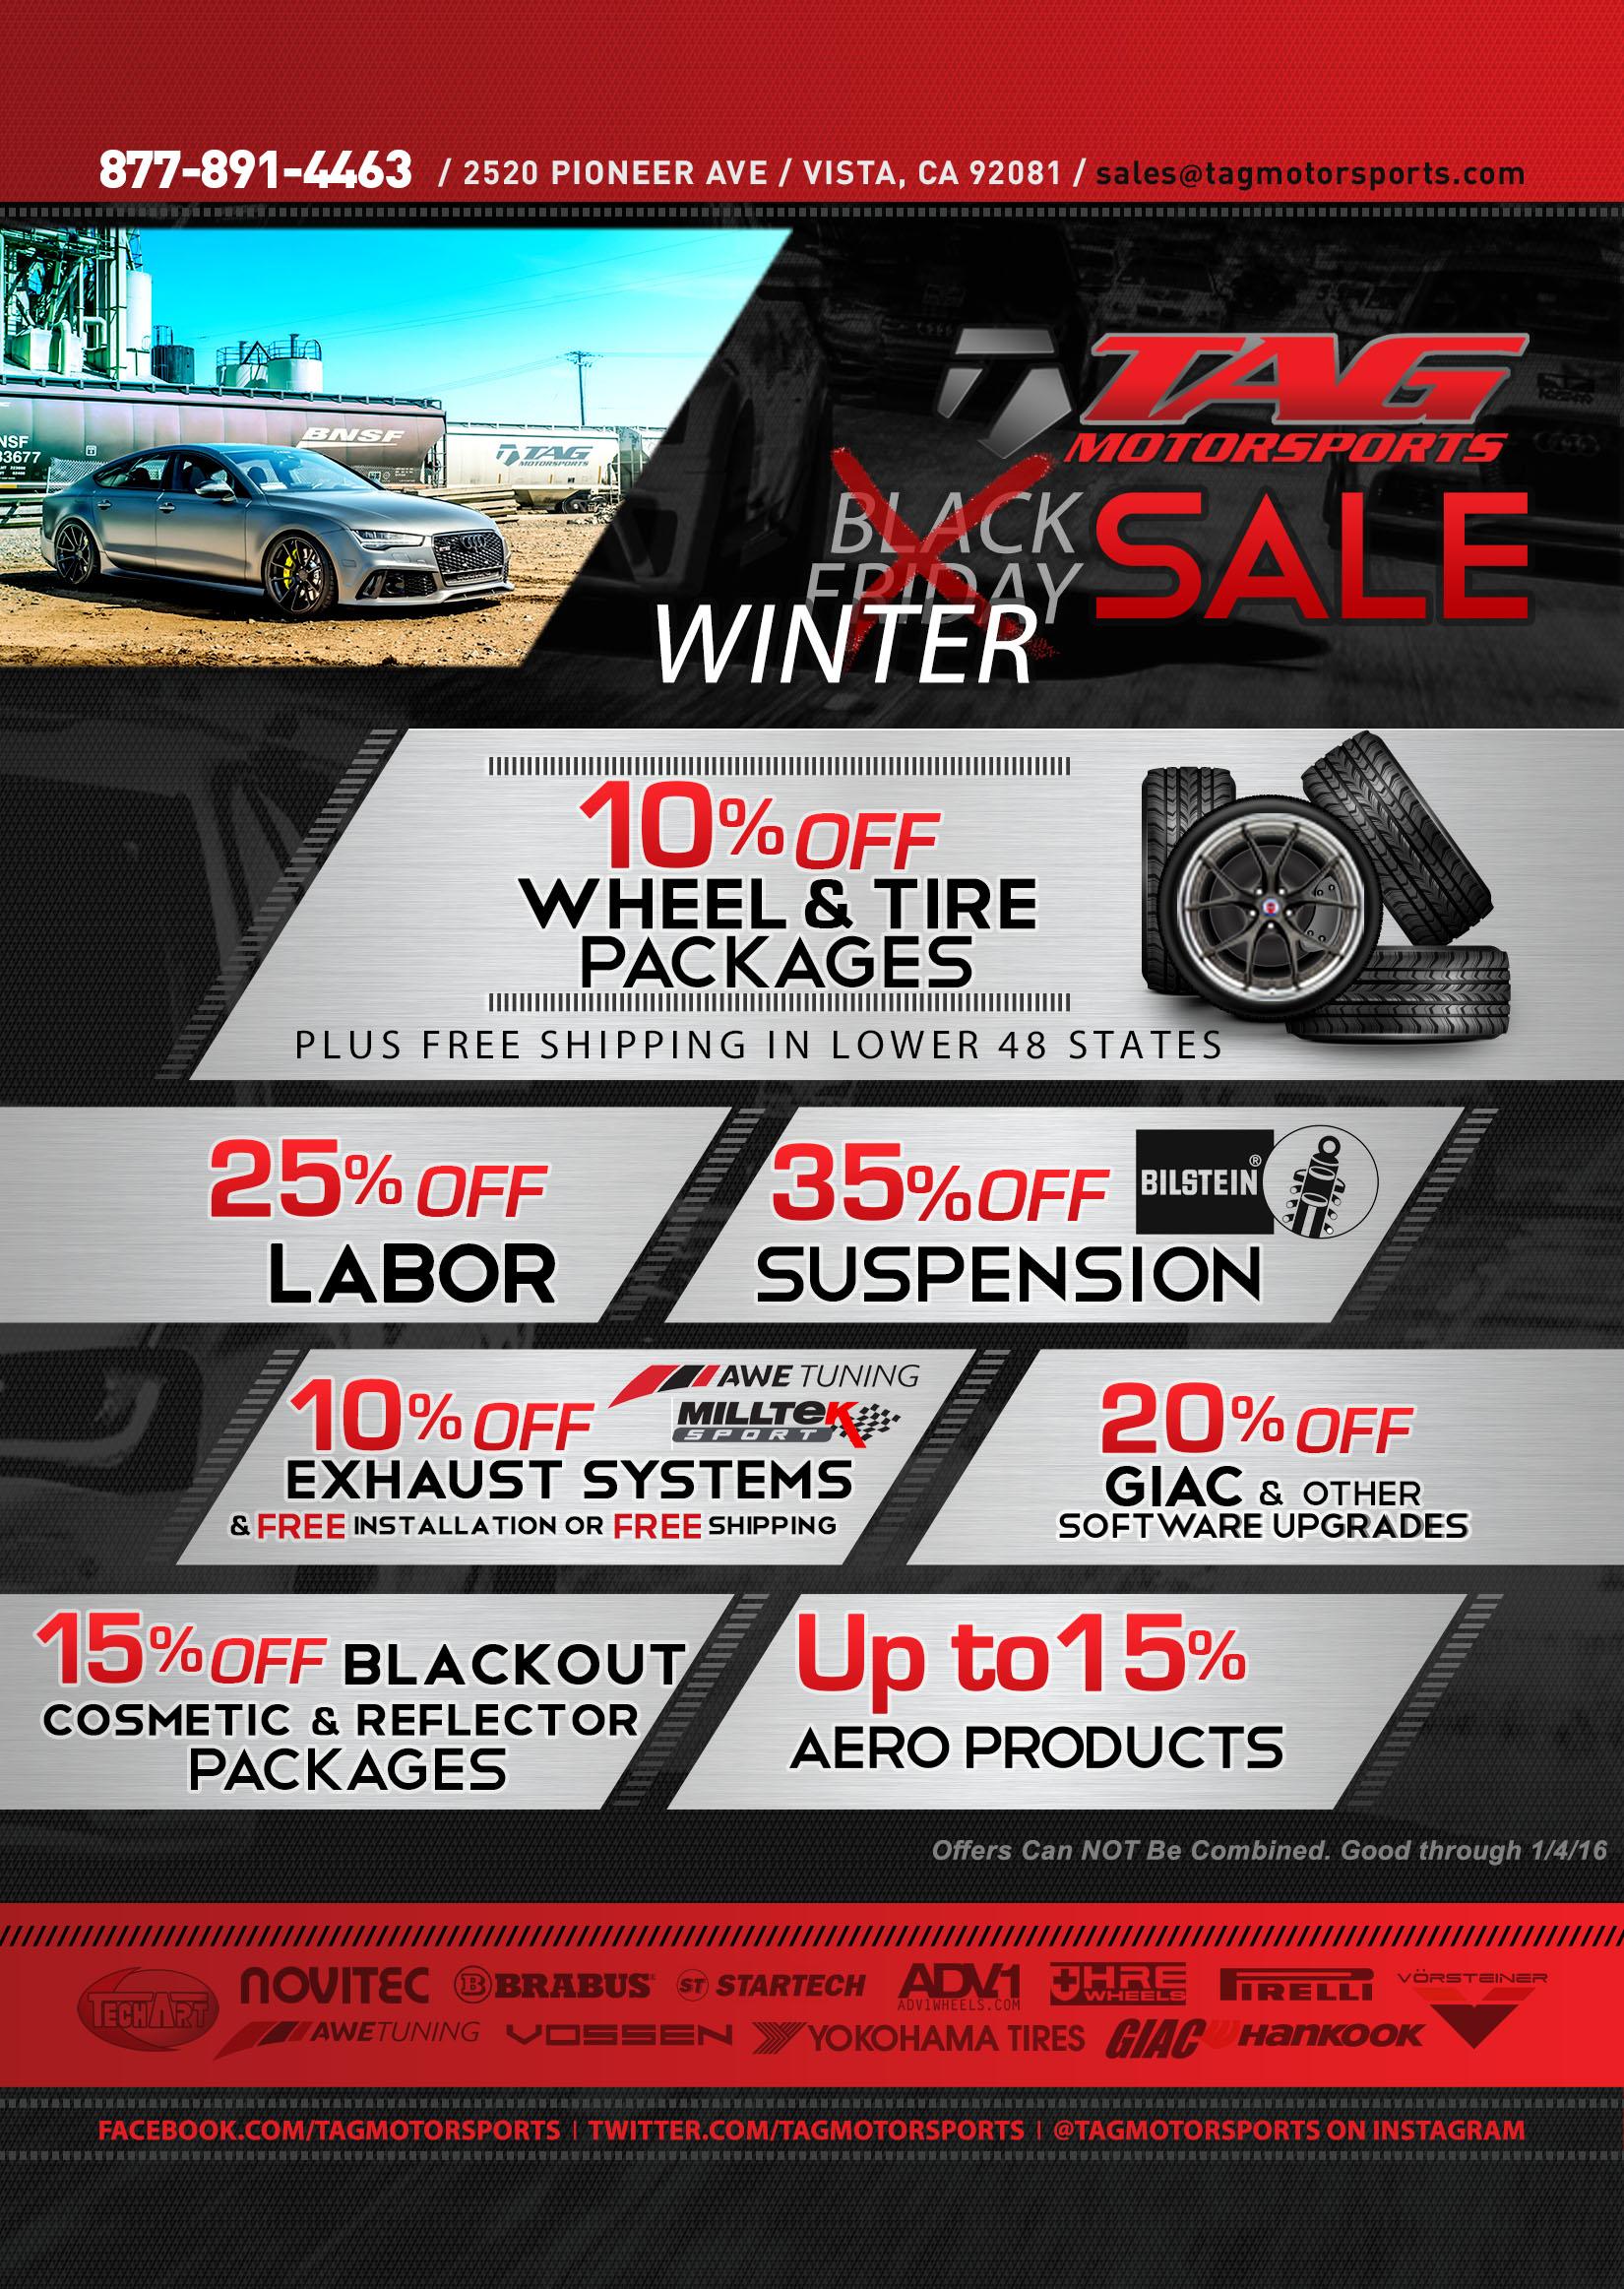 TAG Motorsports | 2015 Winter SALE